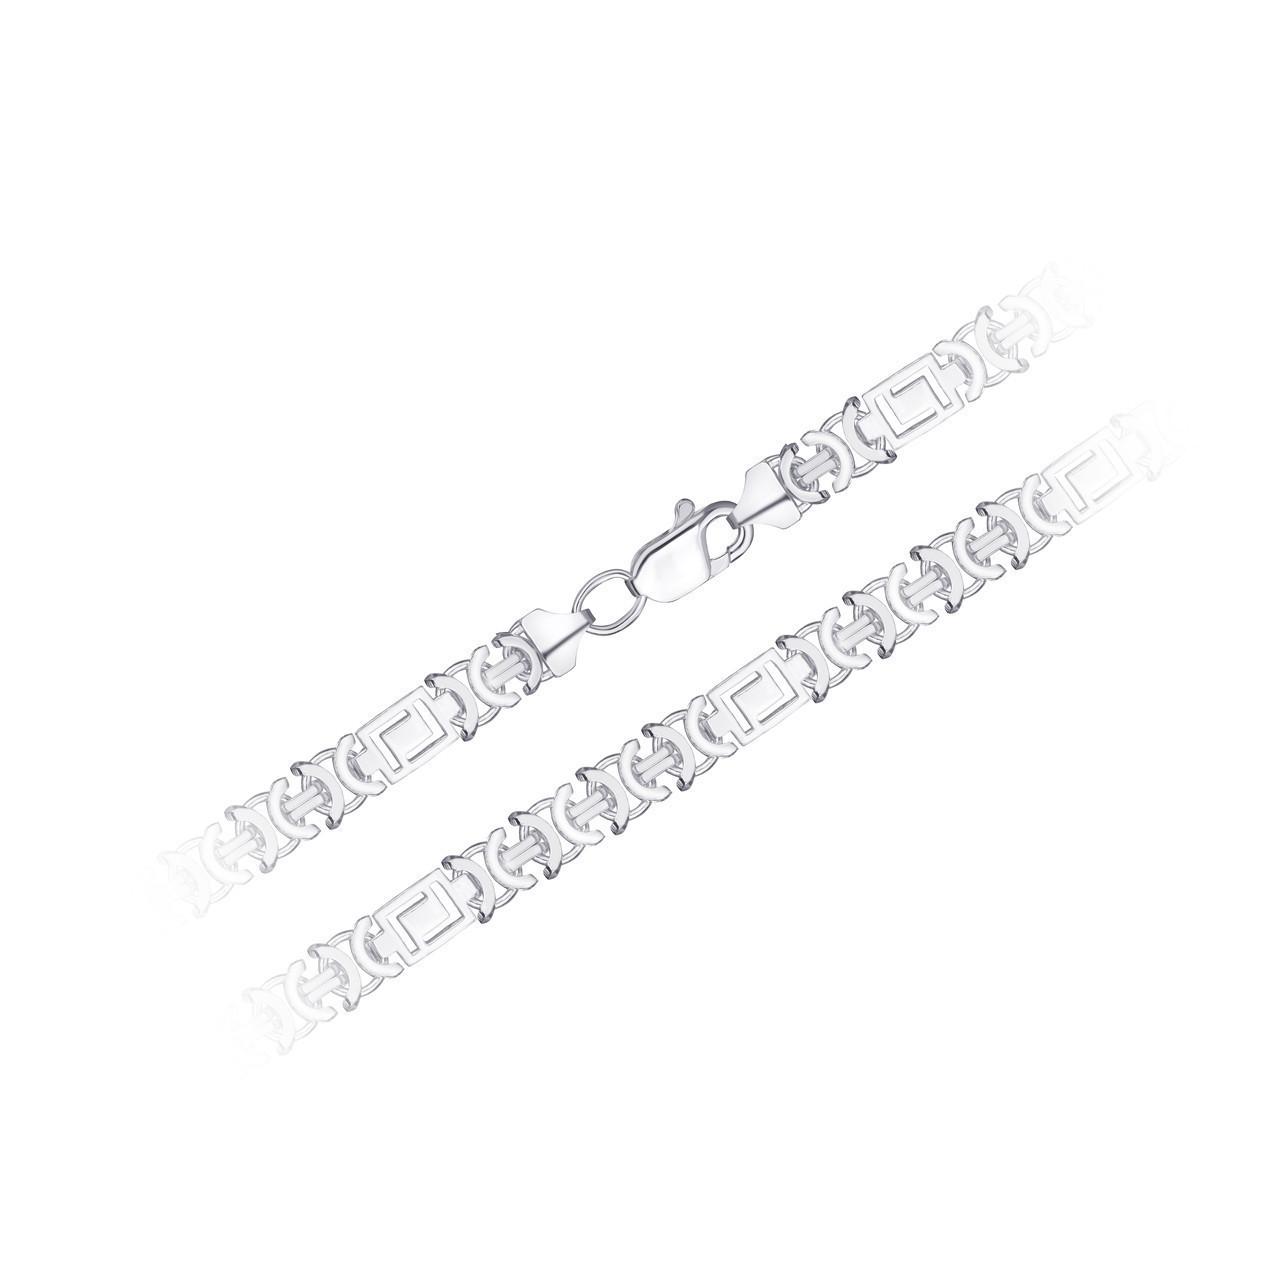 Срібний браслет GS VERSACE (ВЕРСАЧЕ) 23 см